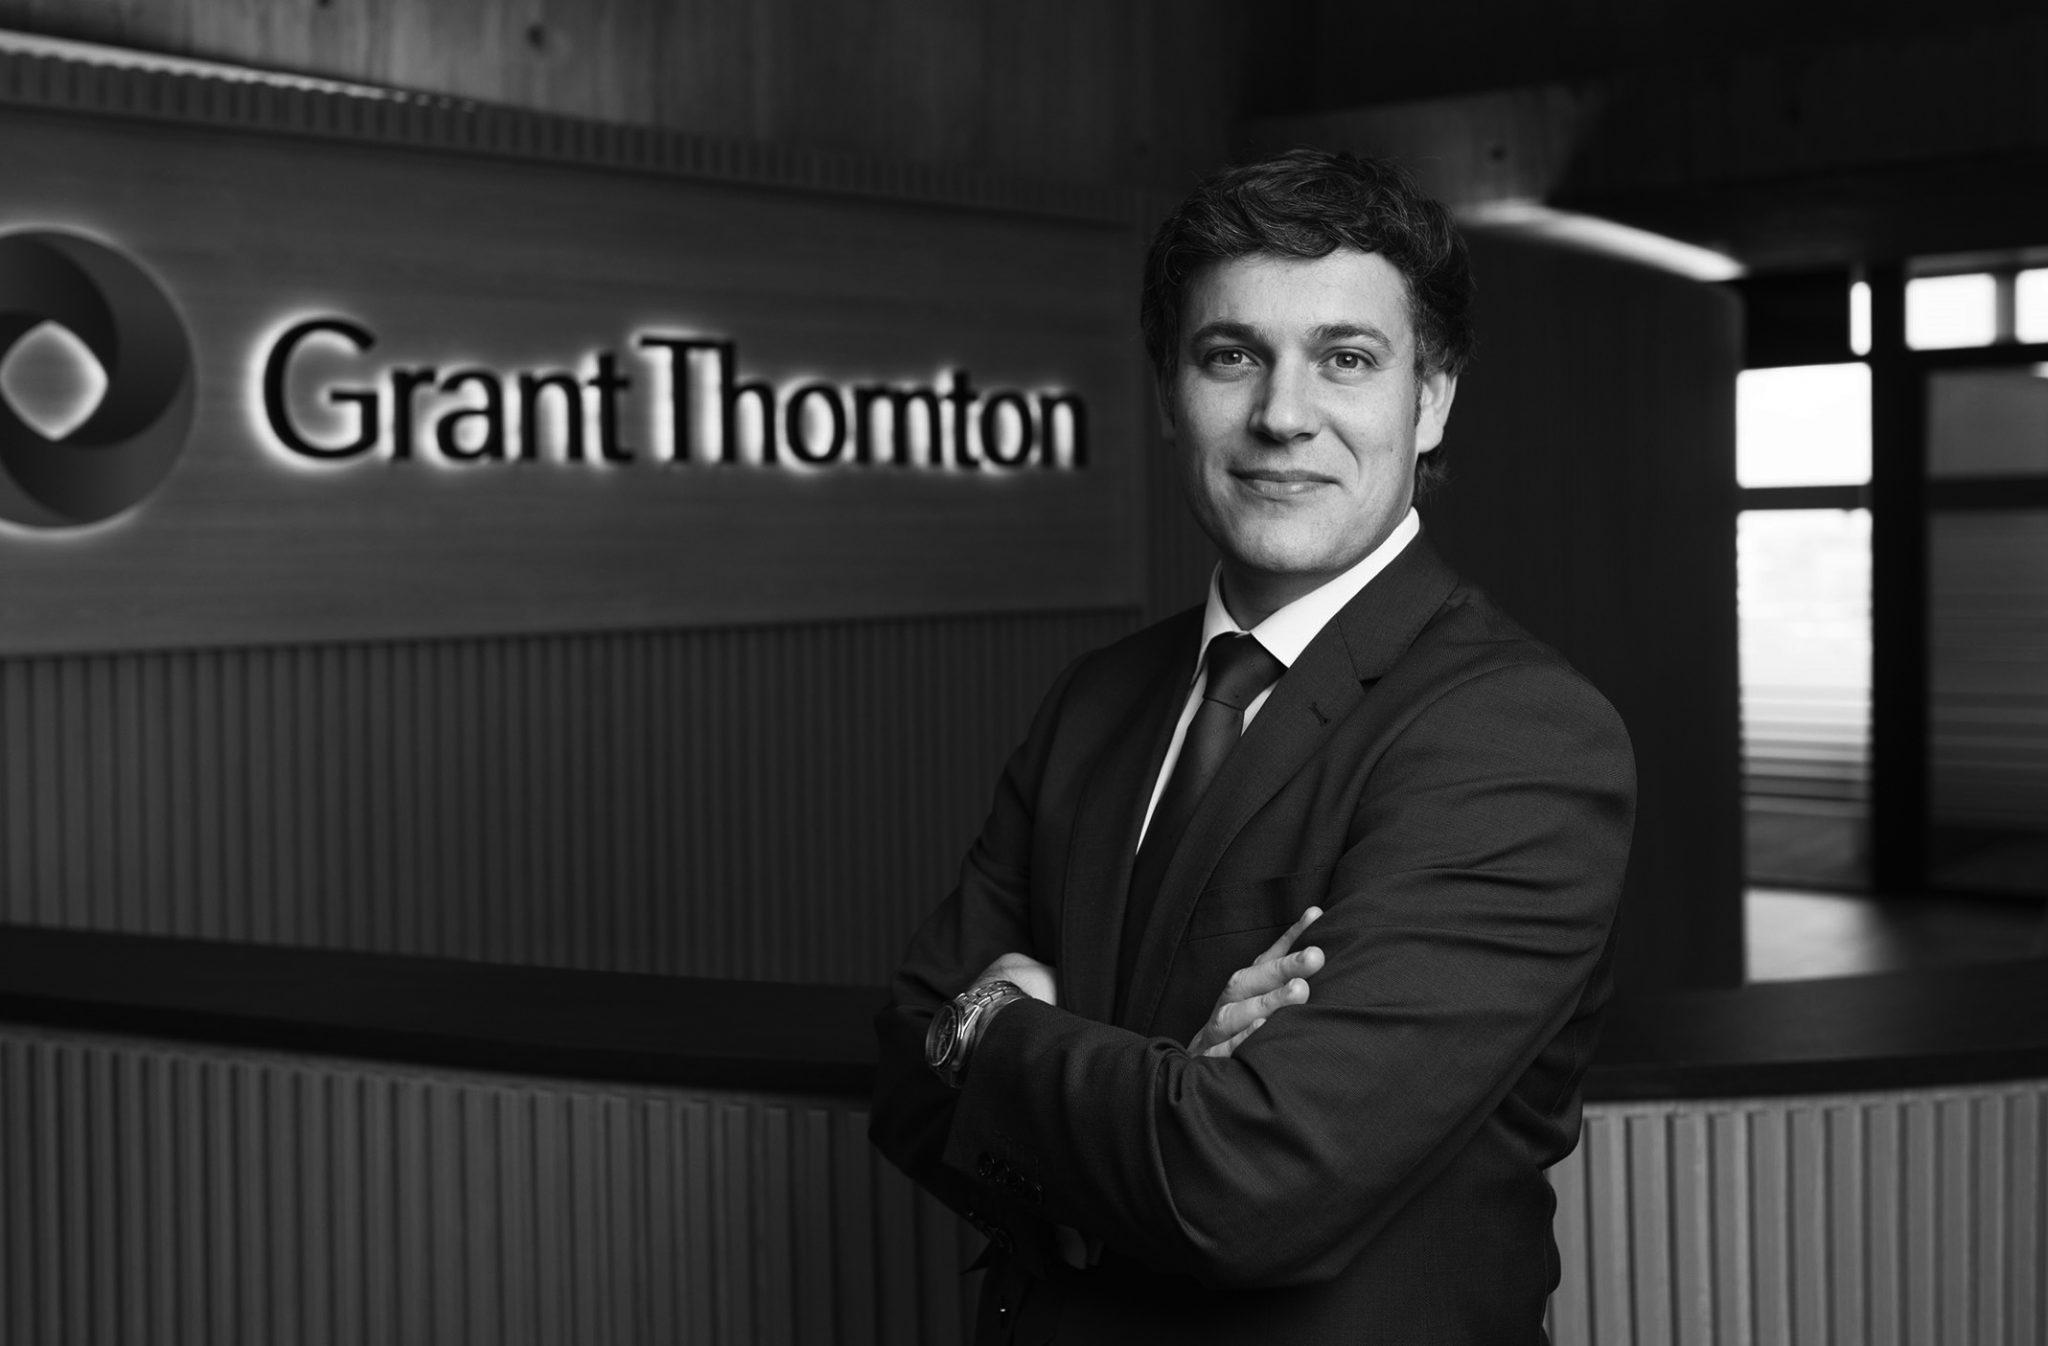 Luis Pastor Grant Thornton